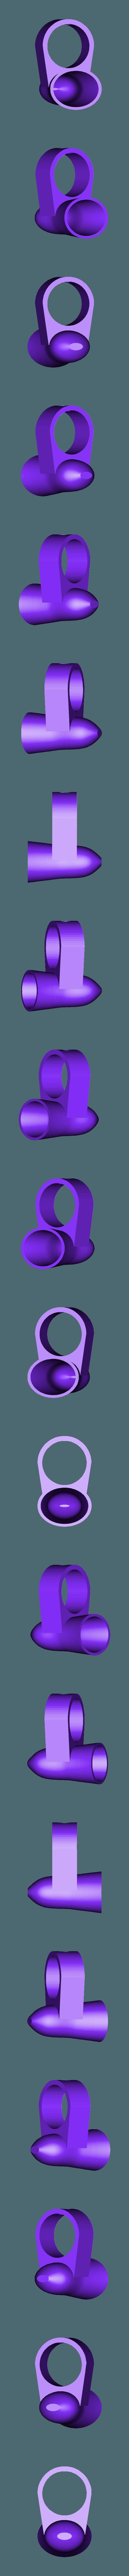 finger_pen.stl Download free STL file Finger Pen • 3D printer design, peluchitoanonimo